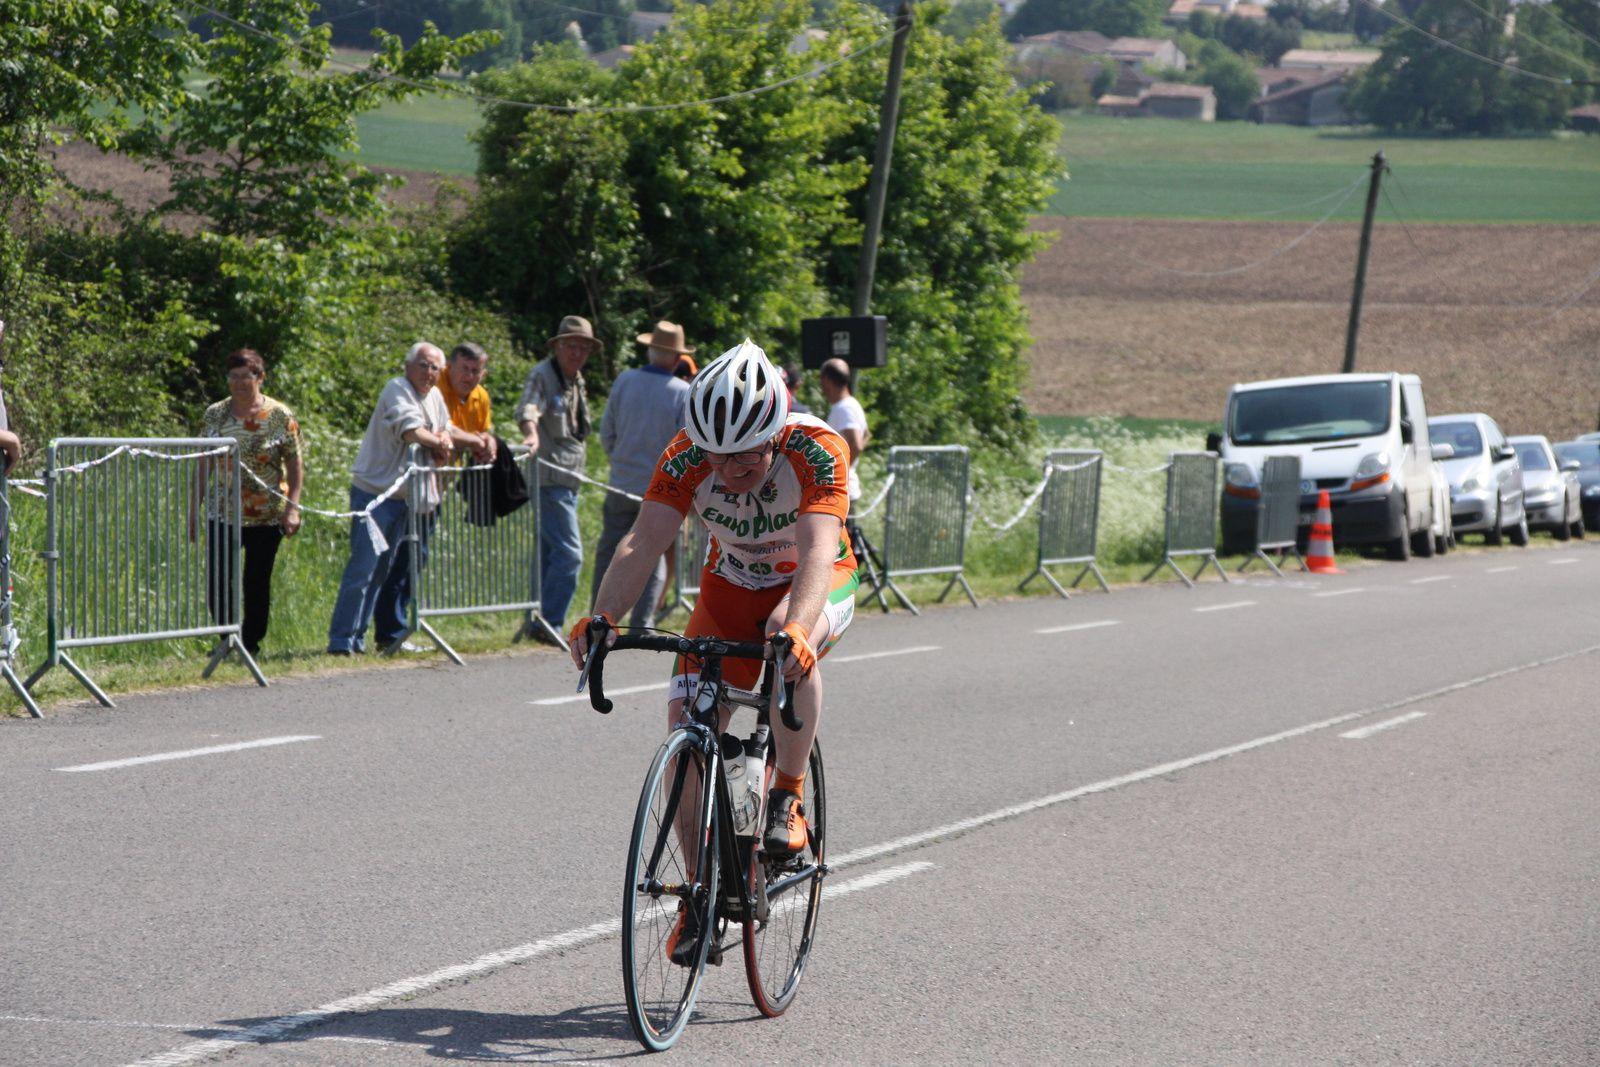 12e  Sébastien  LAURIERE(P  Jonzac), 15e  Laurent  RULLIER(EC 3M), 17e  Cyril  FAVRAUD(EC 3M), 18e  Jean-Yves  MICHAUD(VC  Rochefort)